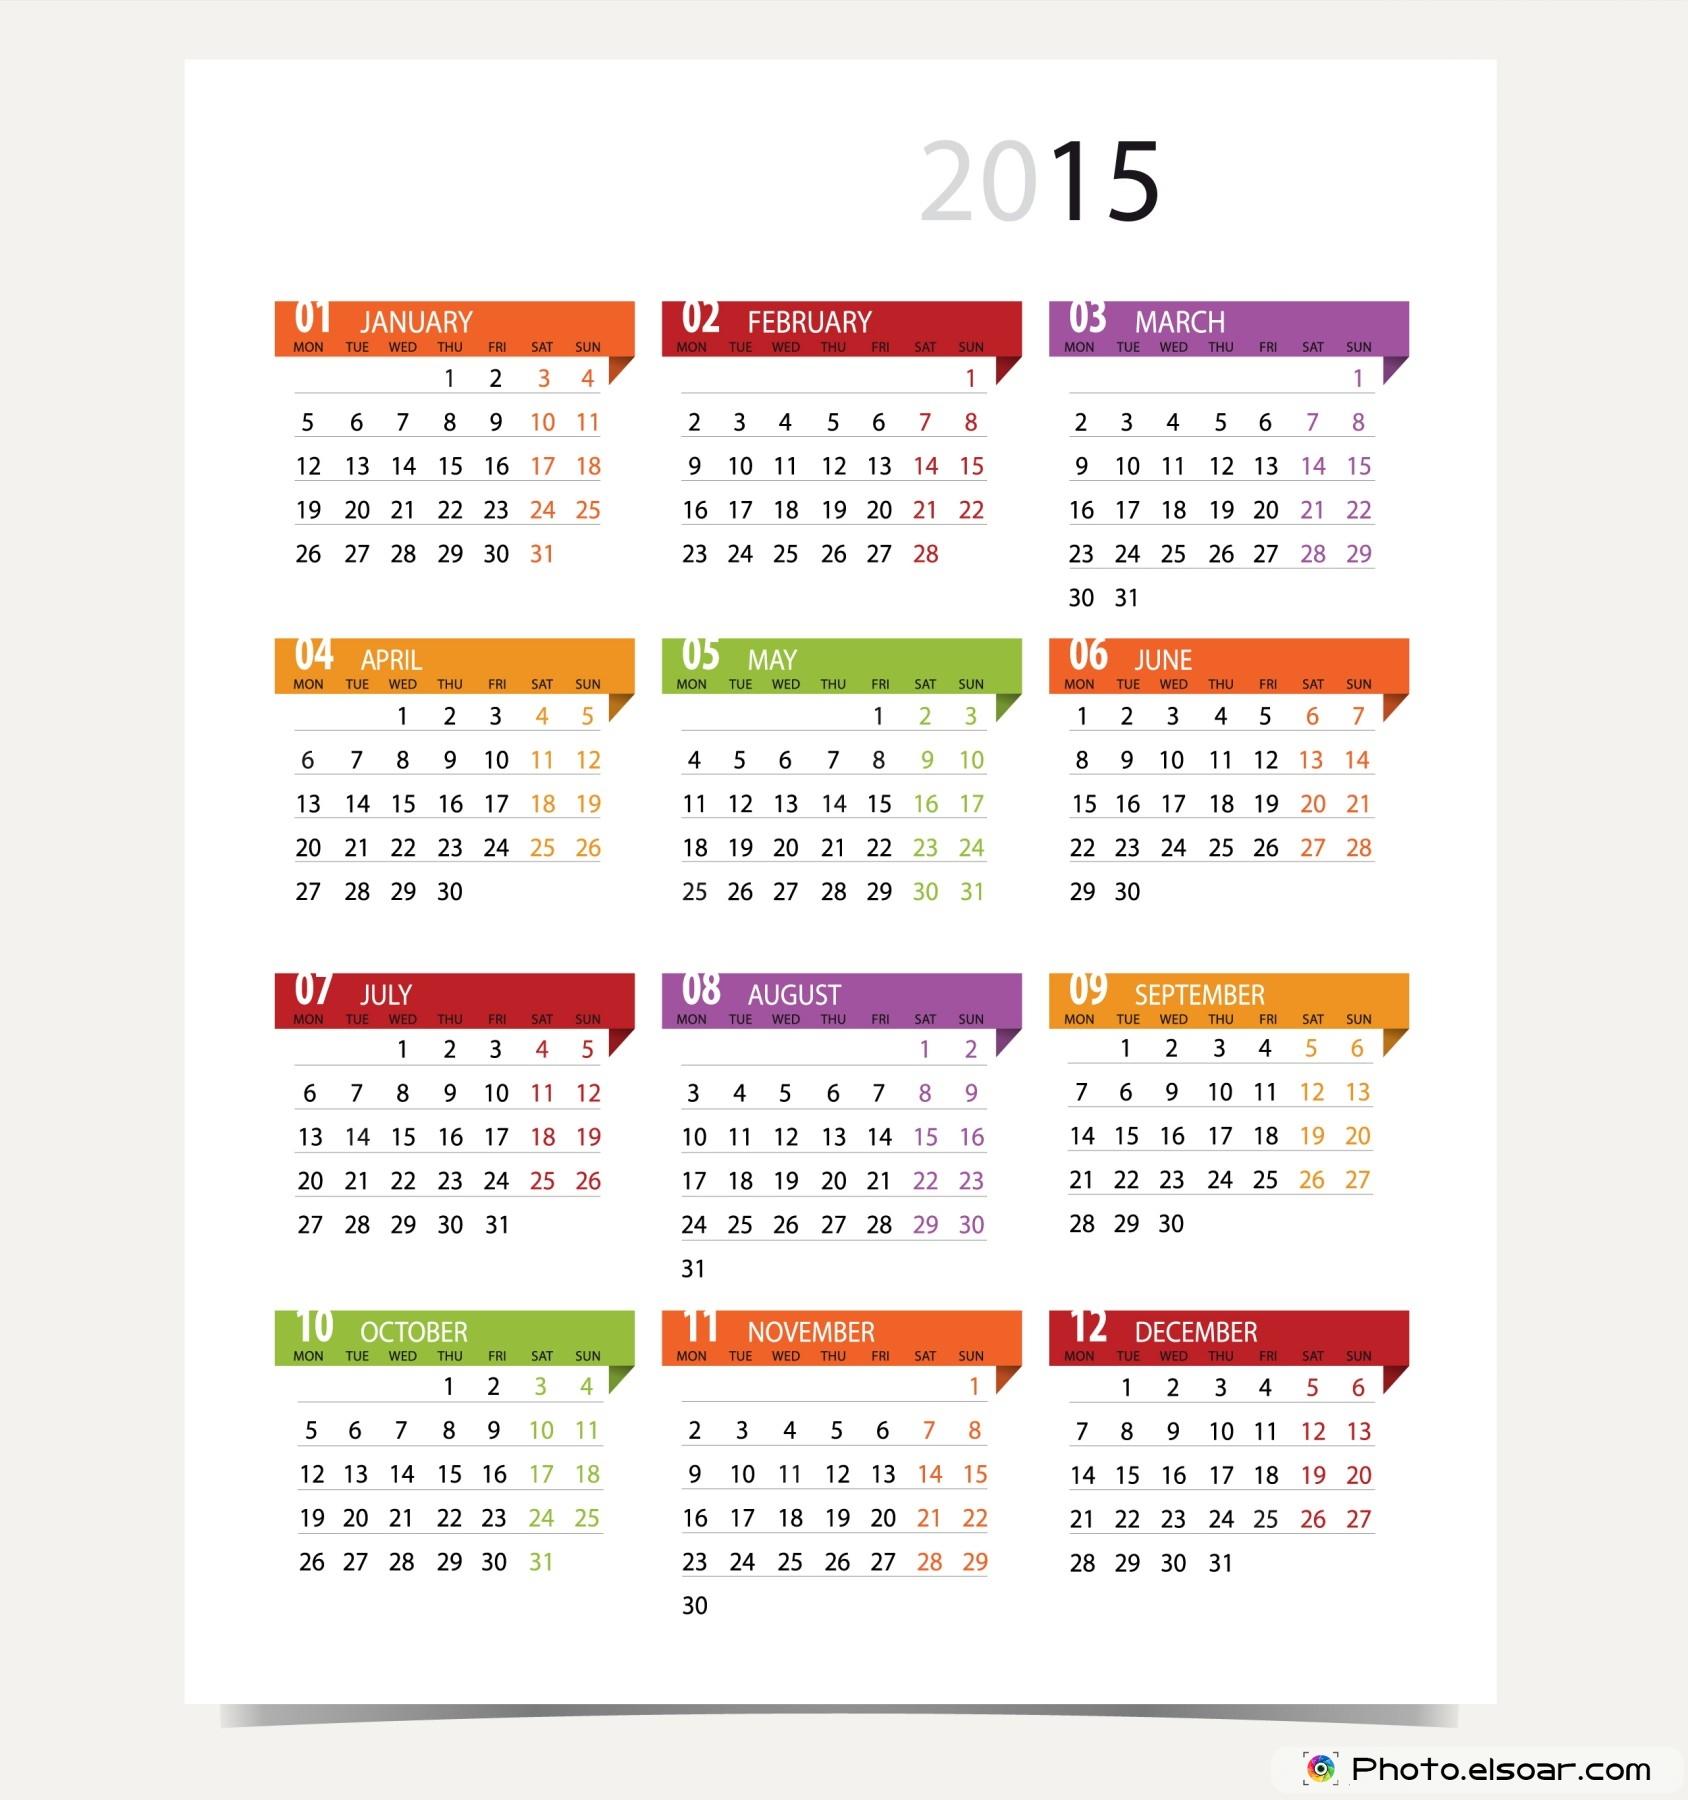 100% Off All 2015 Calendars Designs For Different Trends • Elsoar